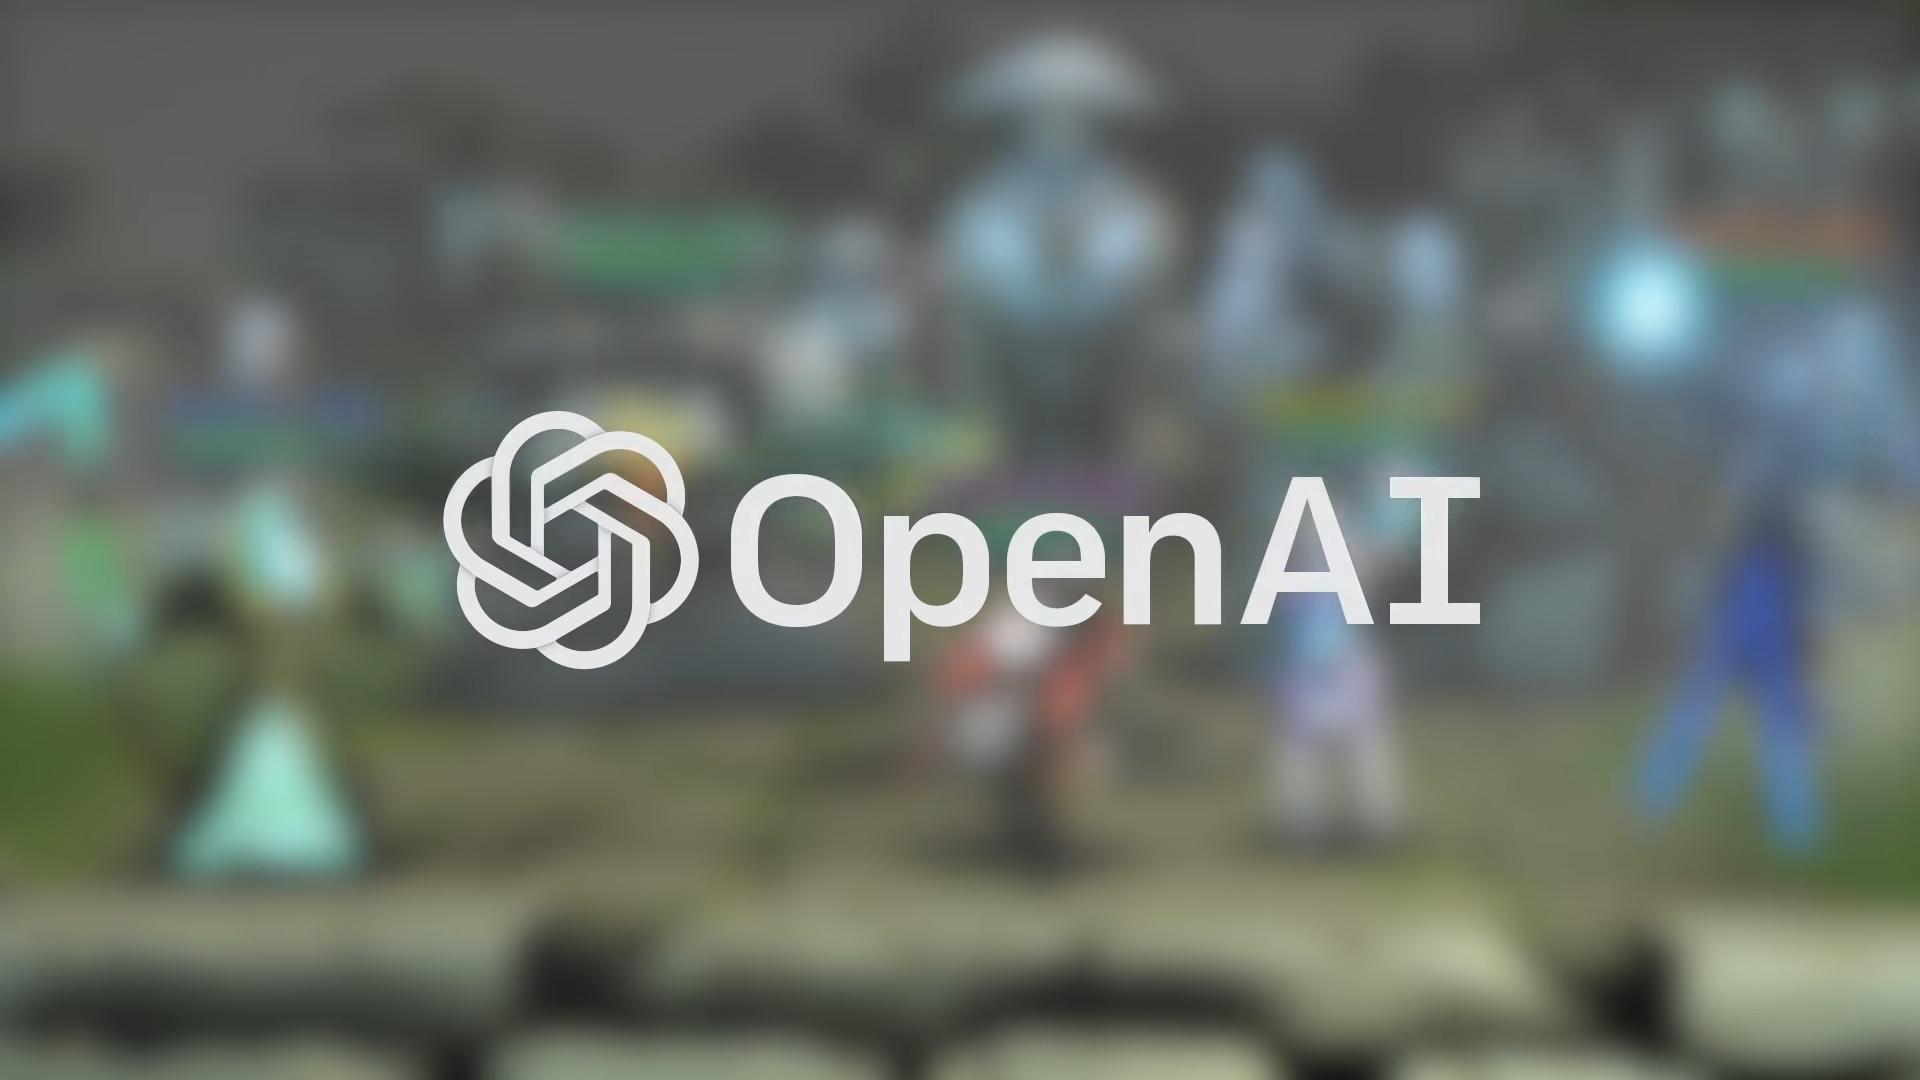 AI Dota 2 team defeats team OG, The International 2018